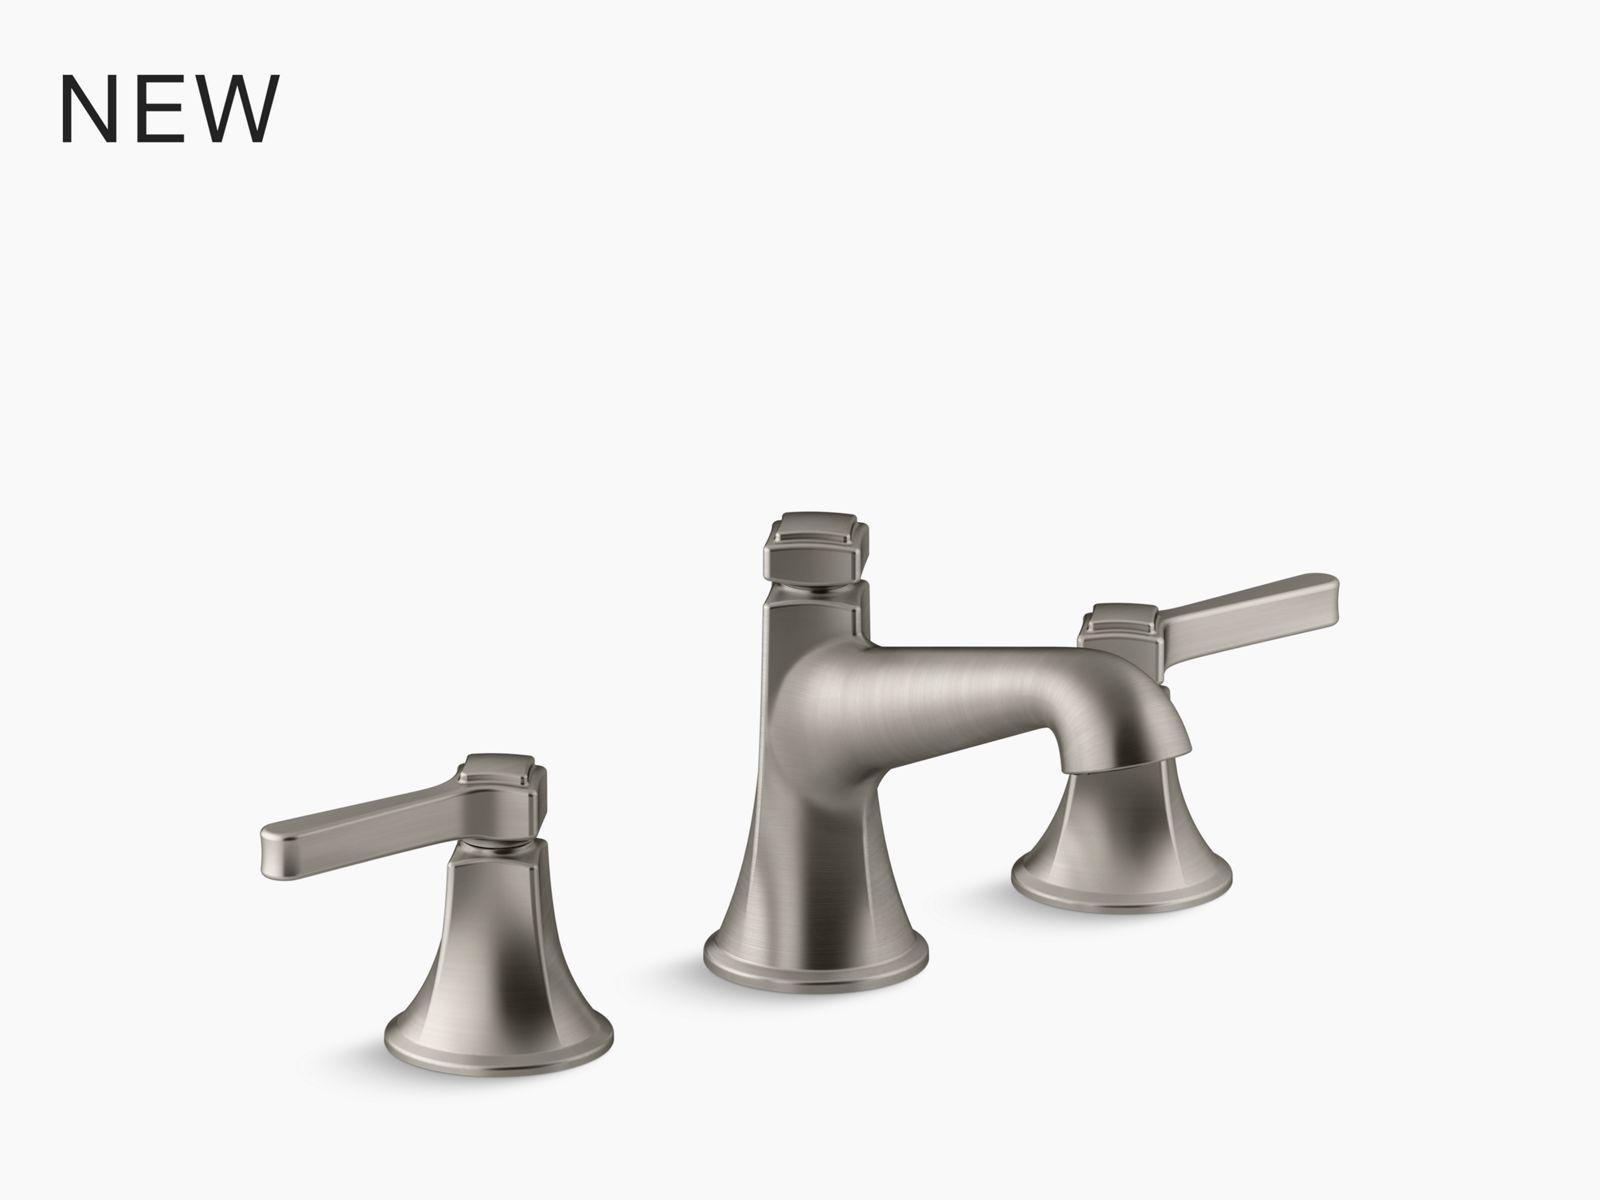 kennon 33 x 22 x 10 1 8 neoroc top mount undermount single bowl kitchen sink